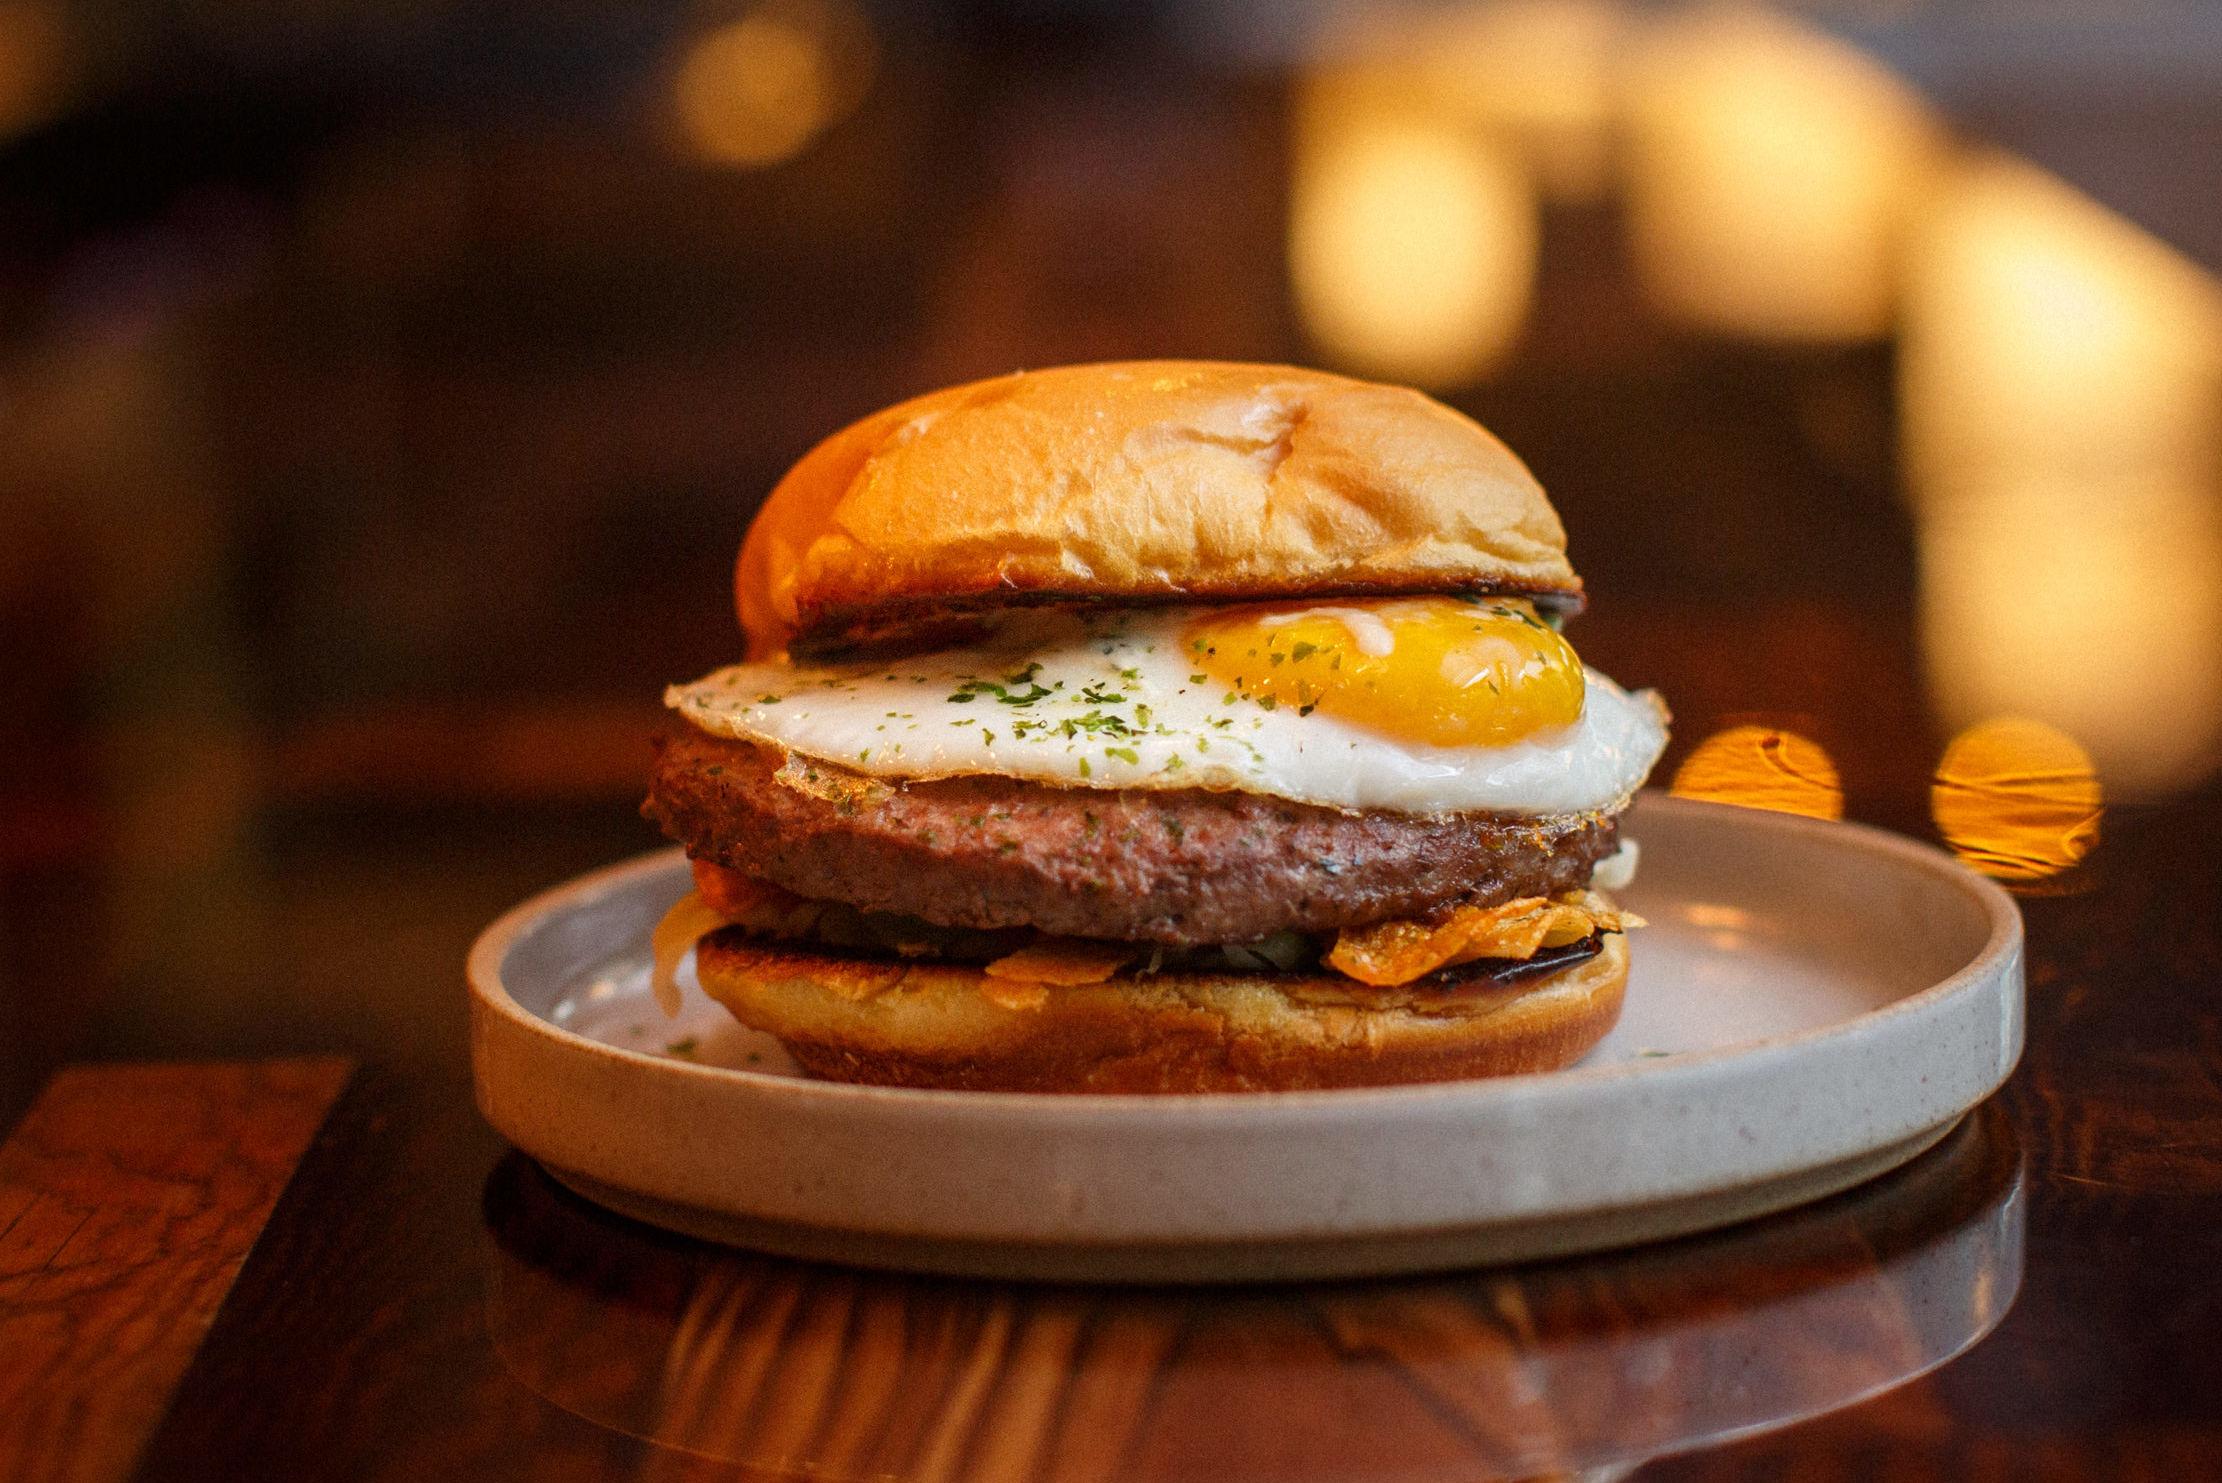 Kats1783.jpg shota s burger gsfouc